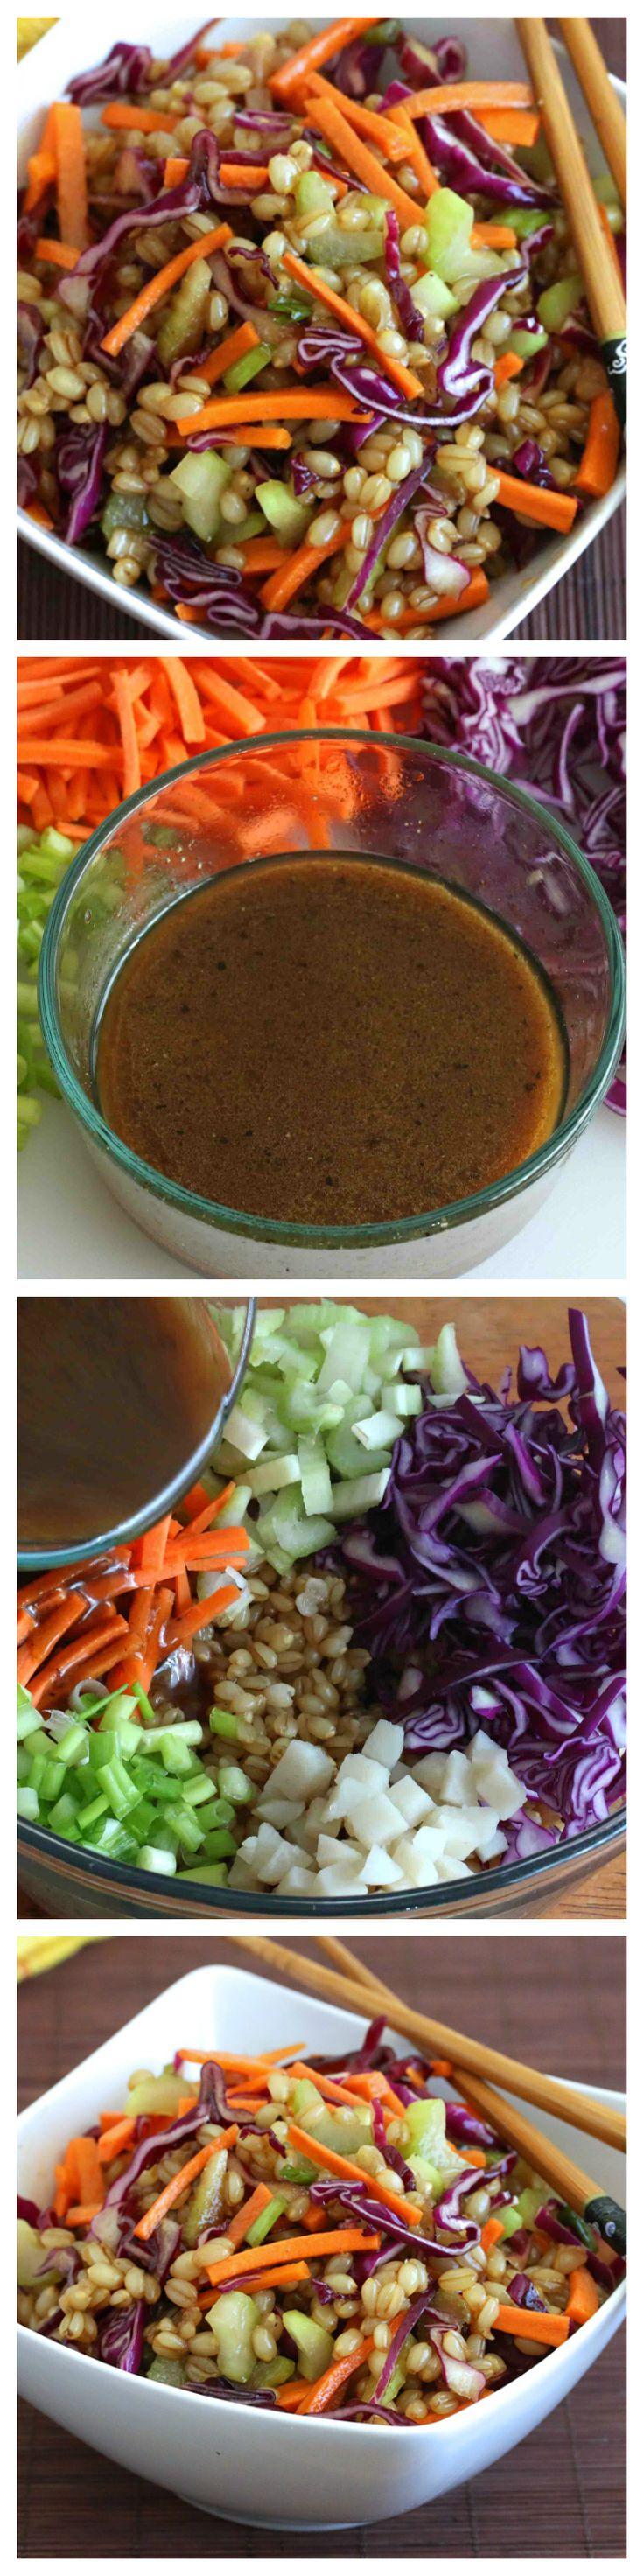 Asian Wheat Berry Salad.  Flavorful, healthy and so delicious!  #recipes #vegetarian #vegan daringgourmet.com